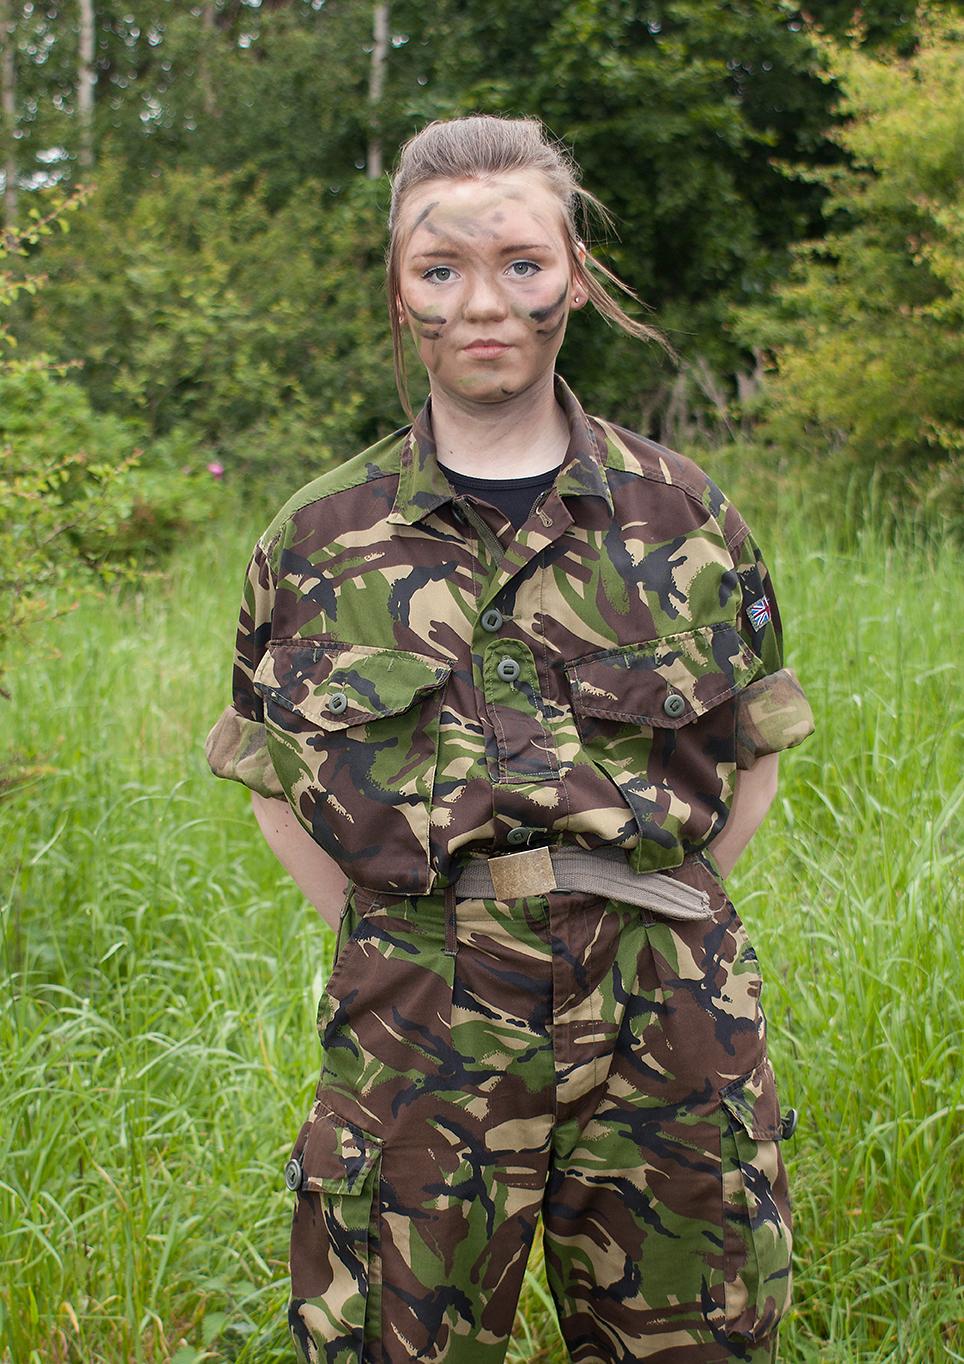 588019. Royal Marine Cadet